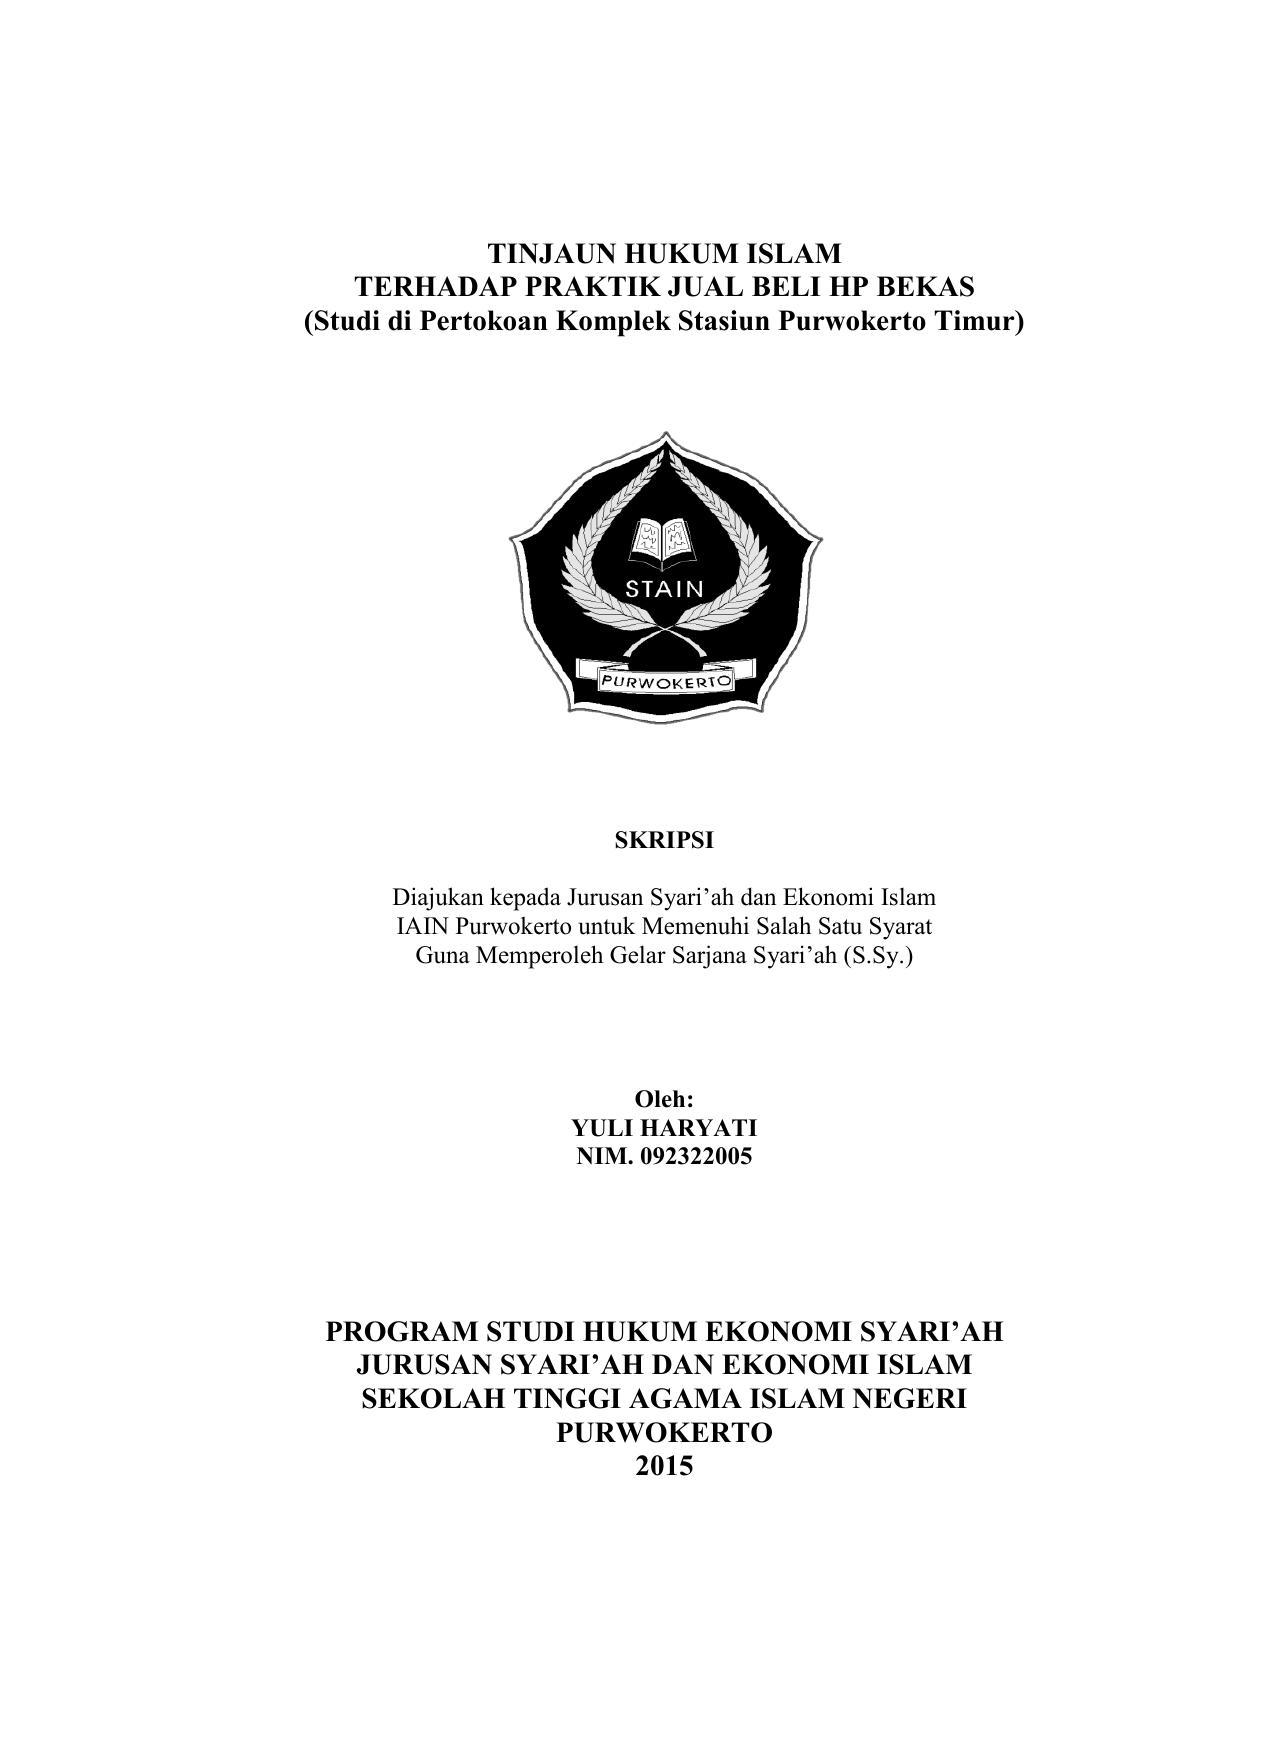 Tinjaun Hukum Islam Terhadap Praktik Jual Beli Hp